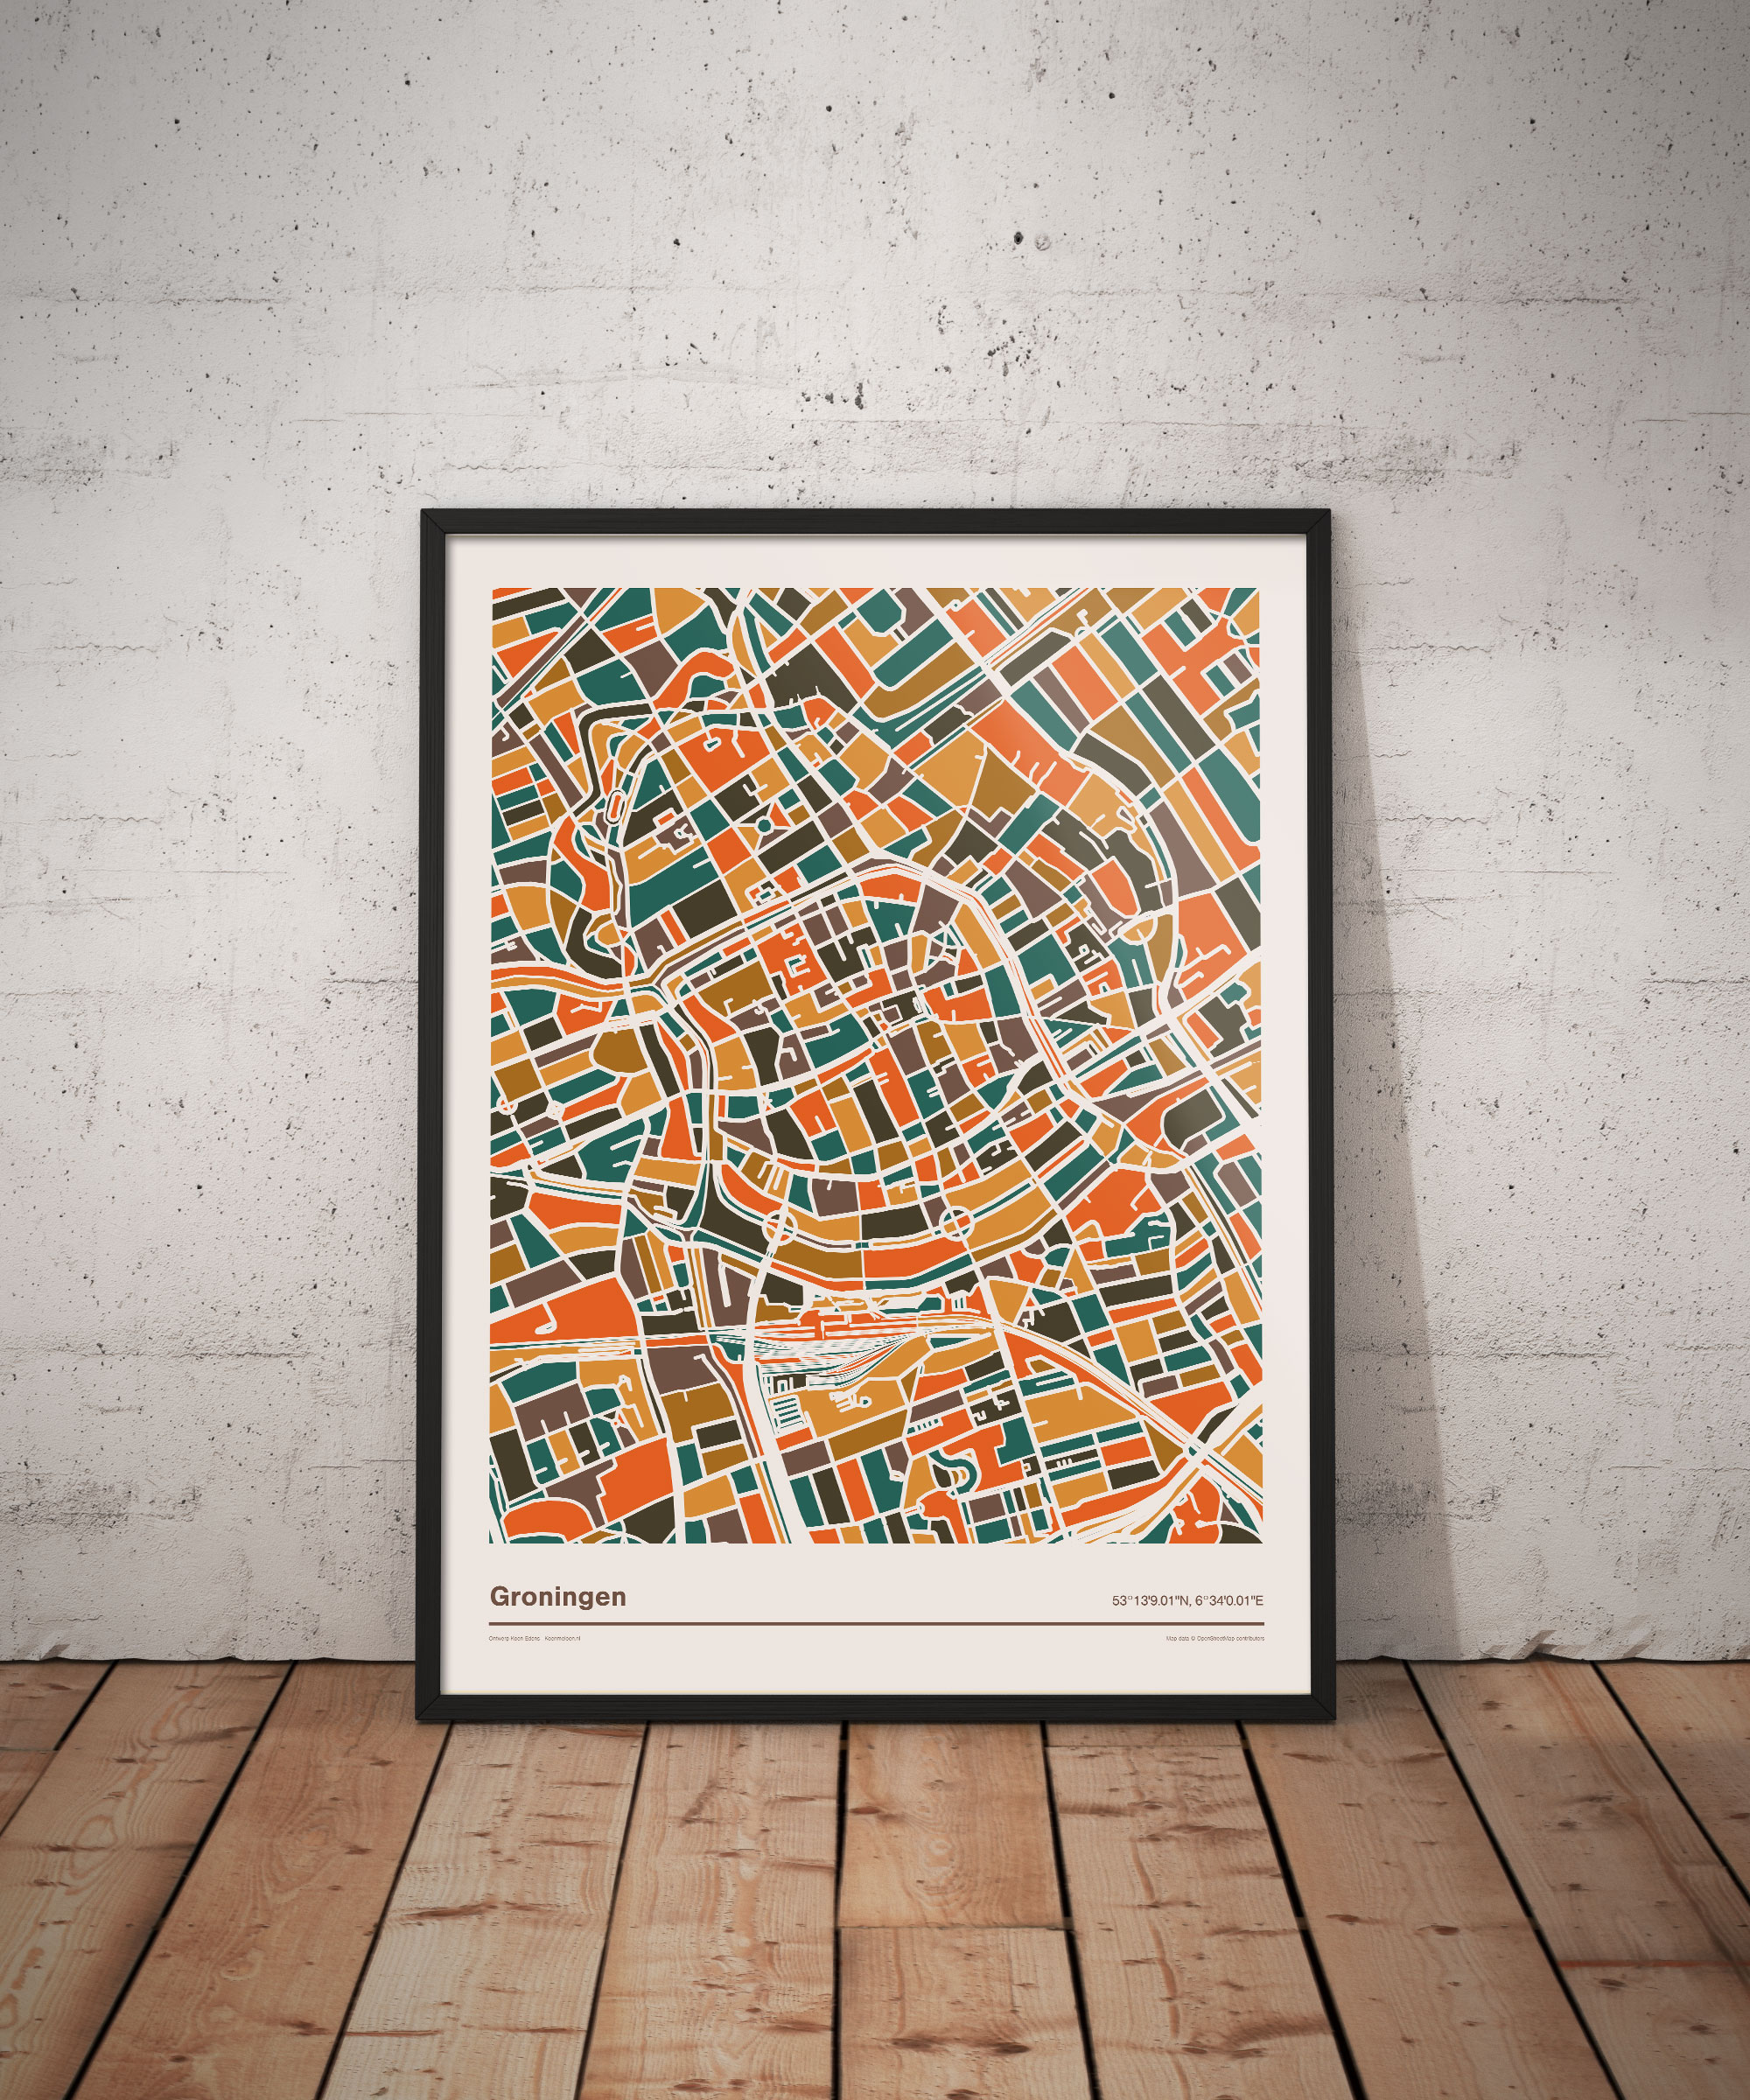 Groningen-mozaiek-poster-print-oranje-bruine-tinten-vloer koenmeloen